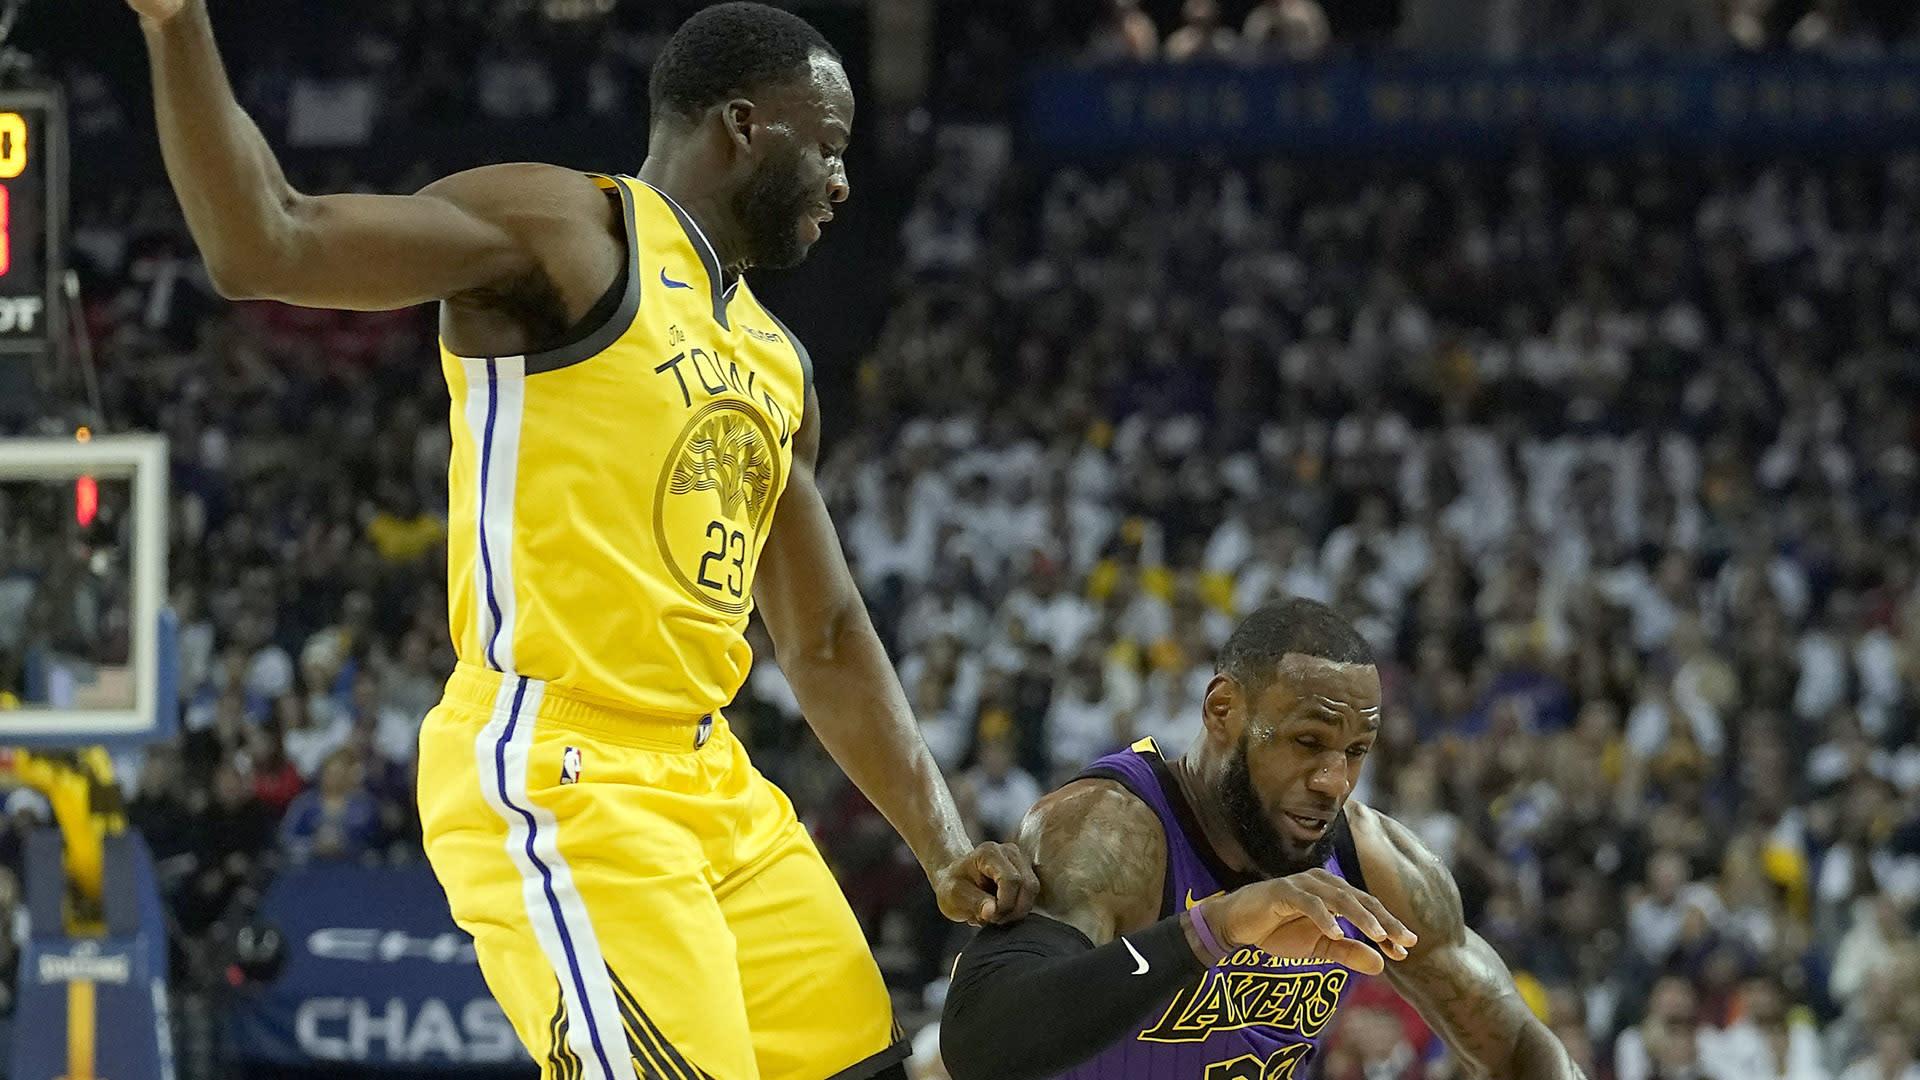 Draymond Green calls not playing LeBron James in NBA playoffs a 'mindf--k'